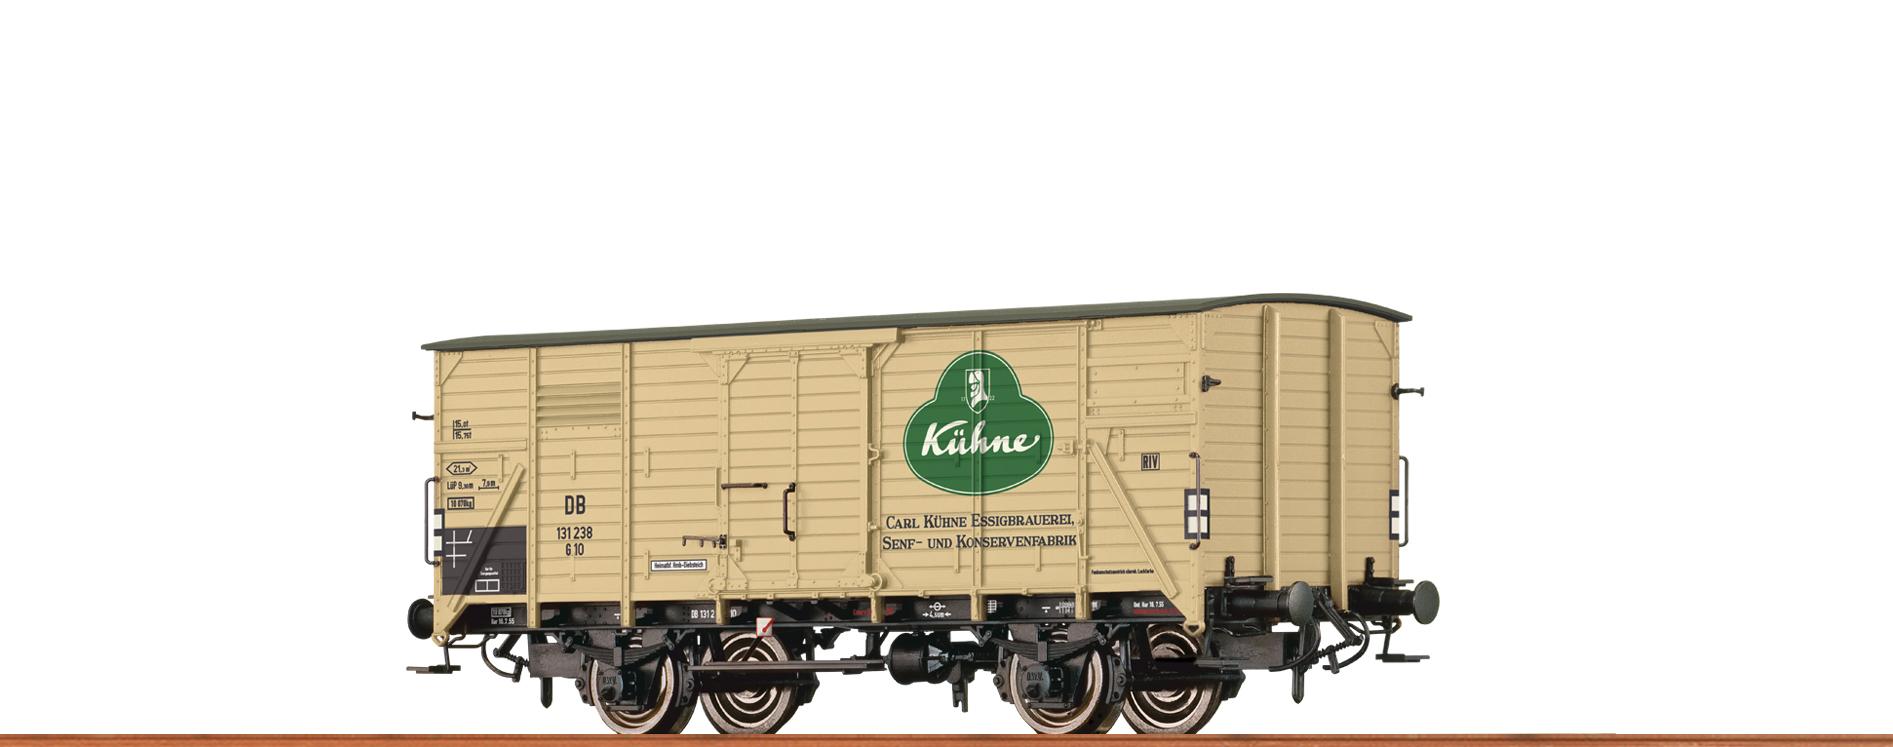 Brawa 49730 Güterwagen G10 DB III Kühne